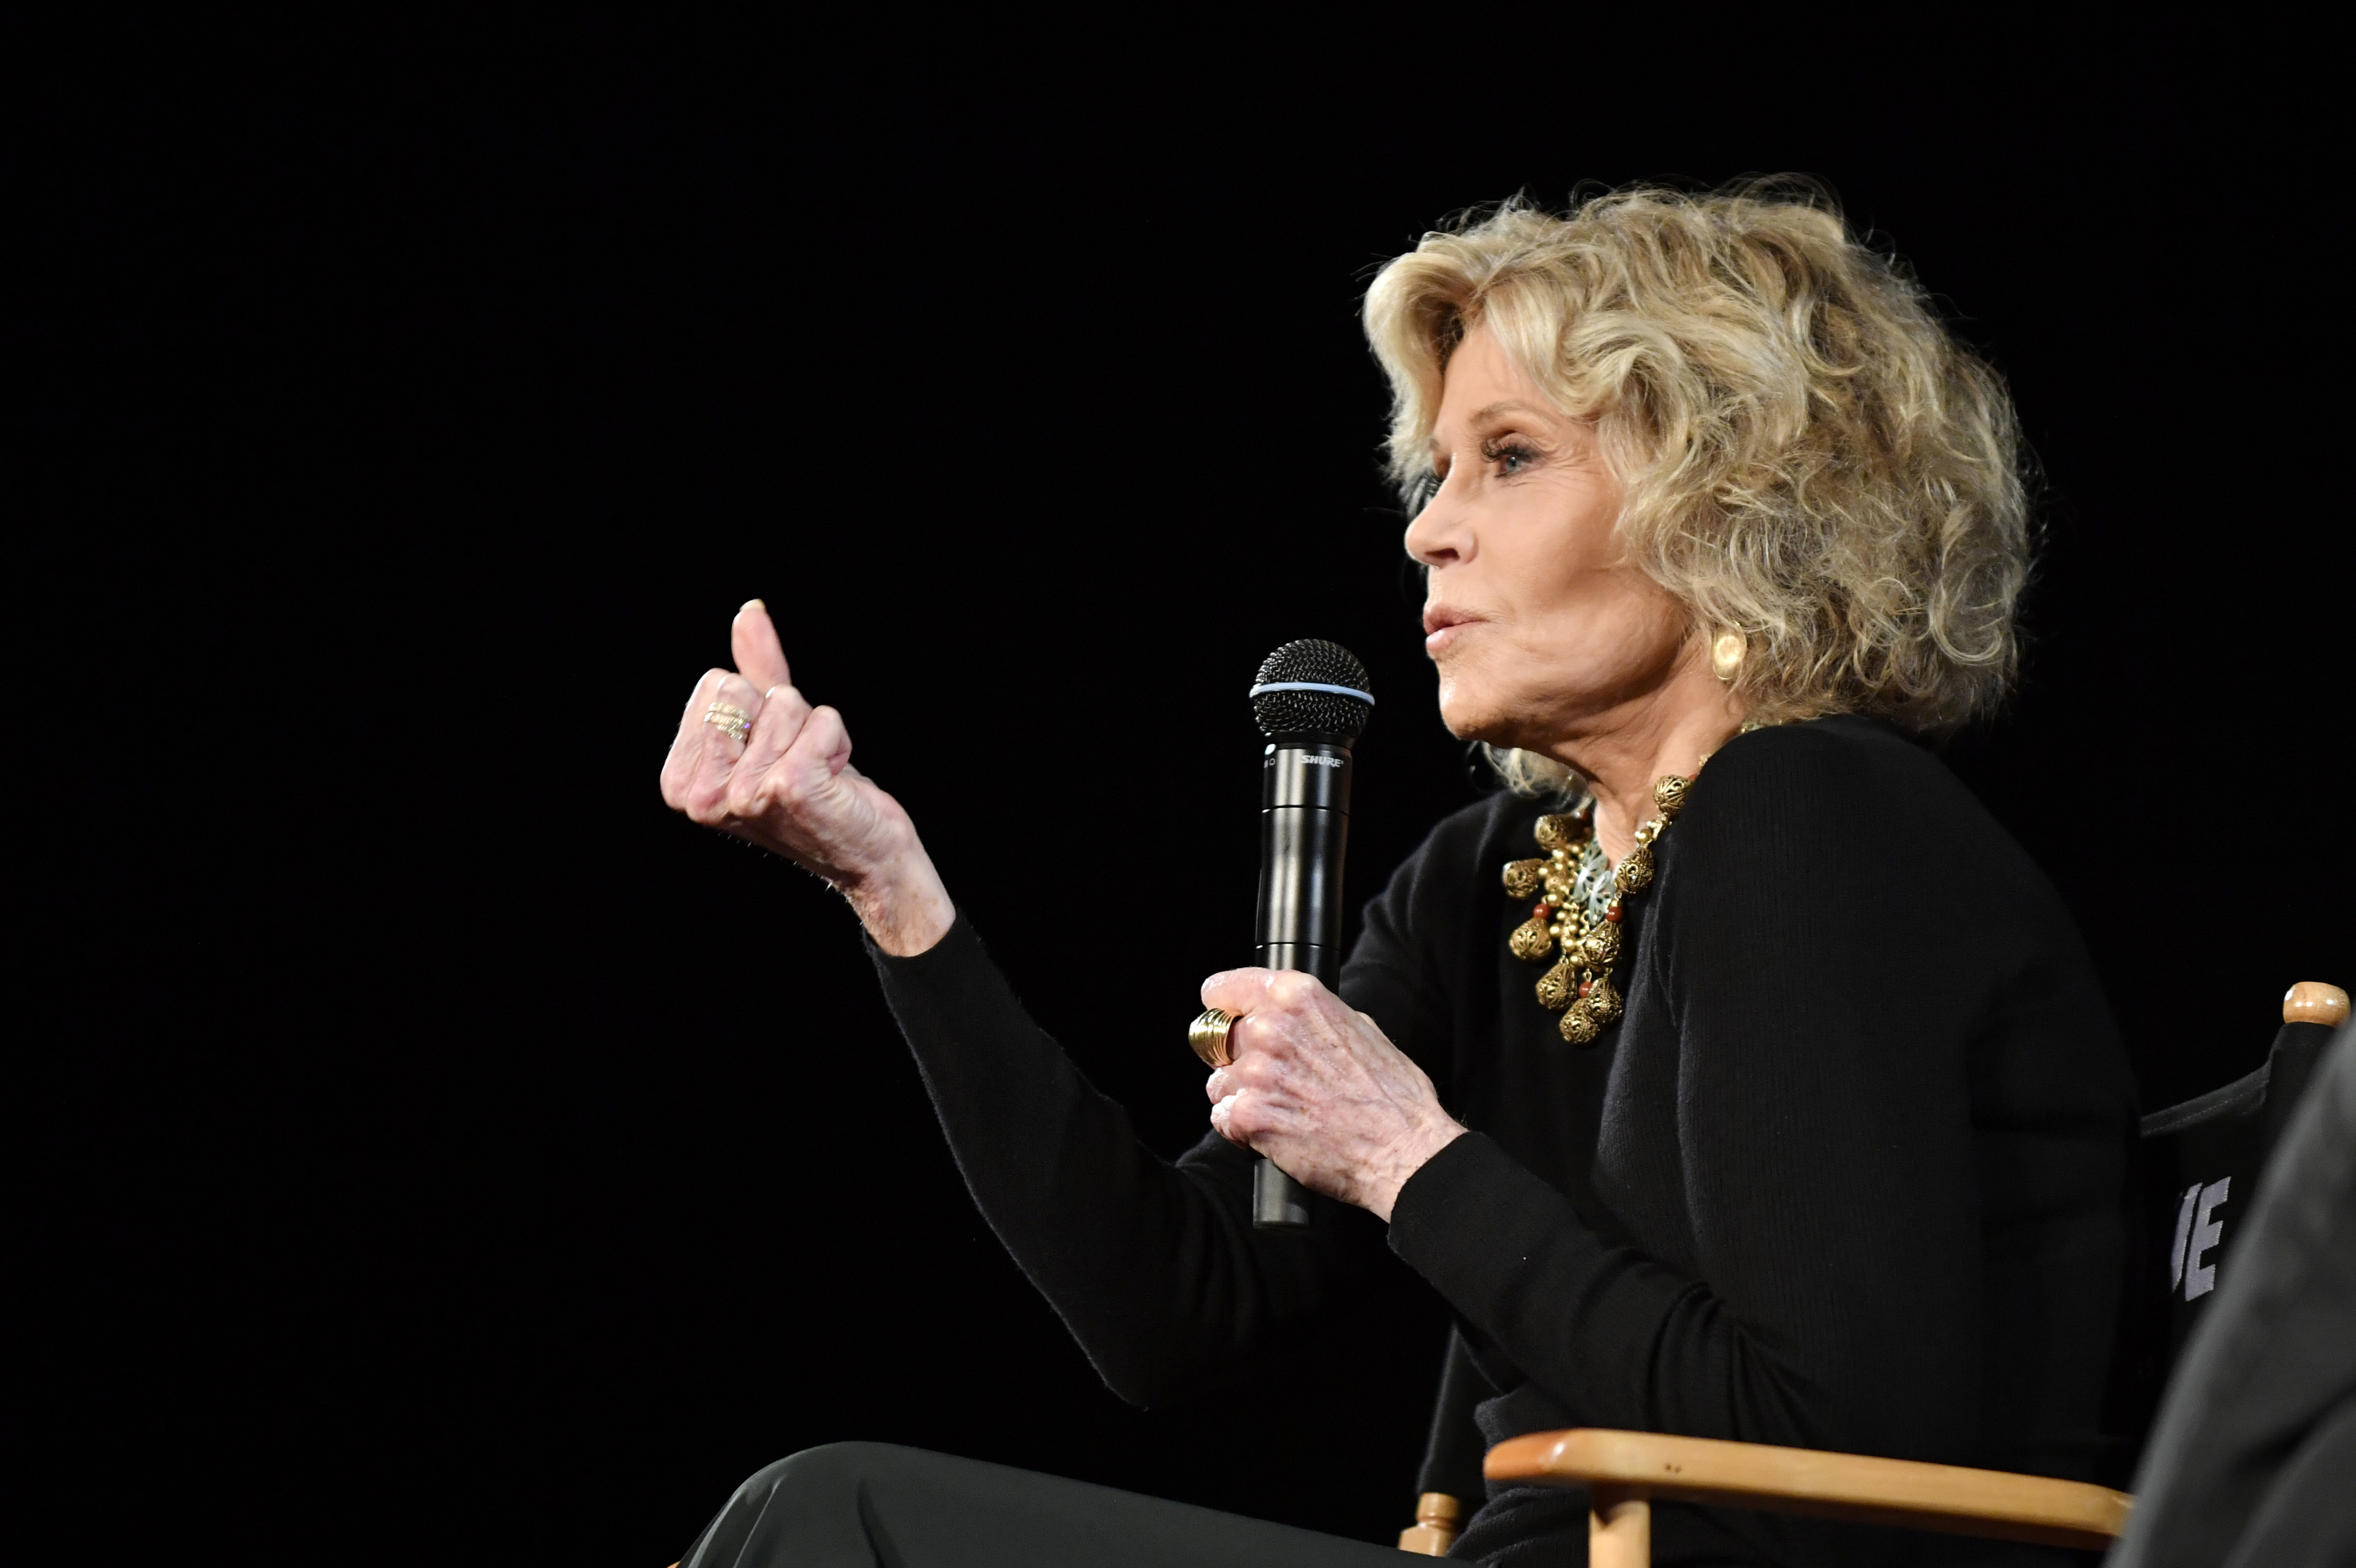 Jane Fonda spoke at a Kering Woman in Motion event